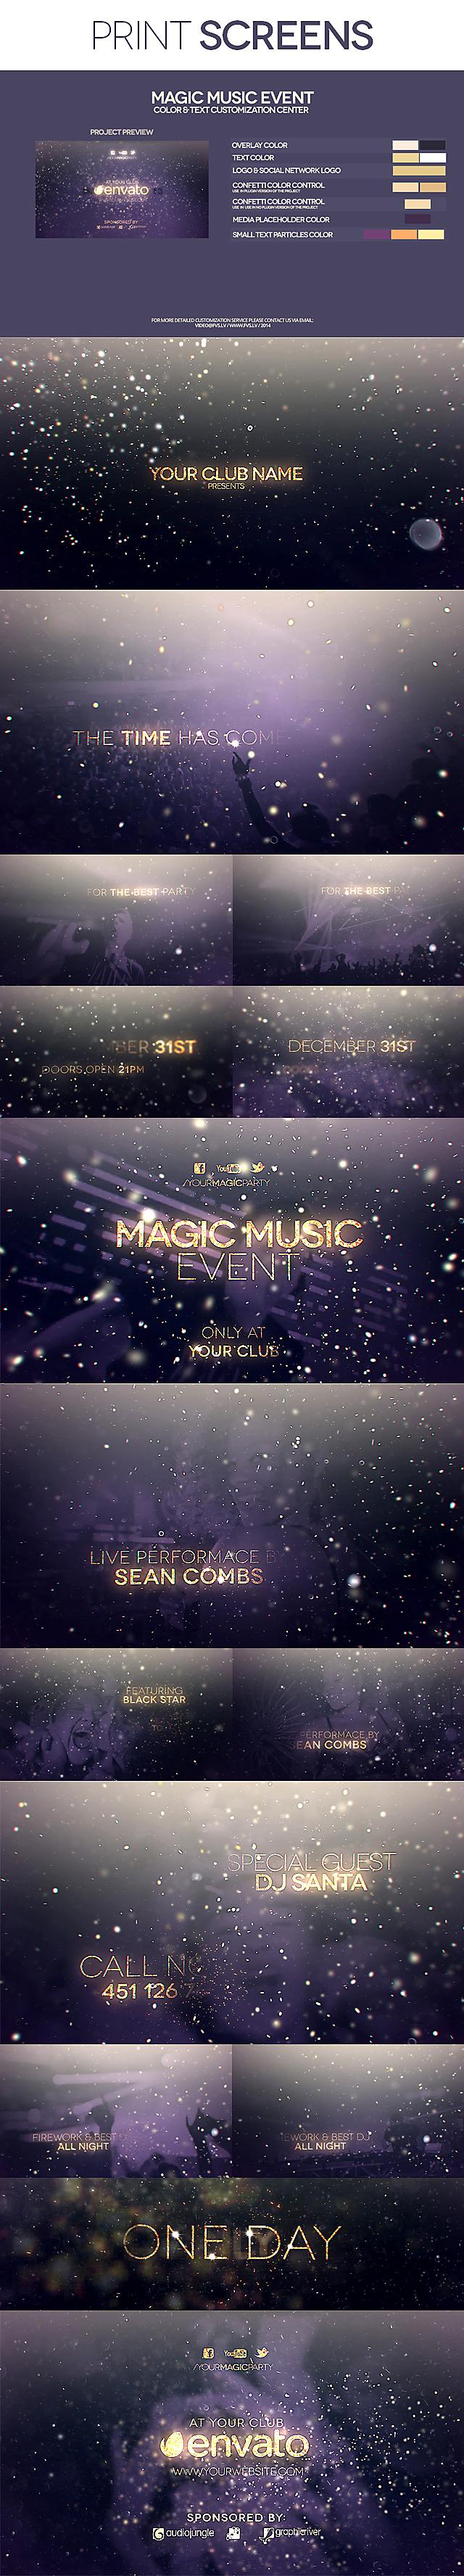 Magic Music Event  v2.0 - 11